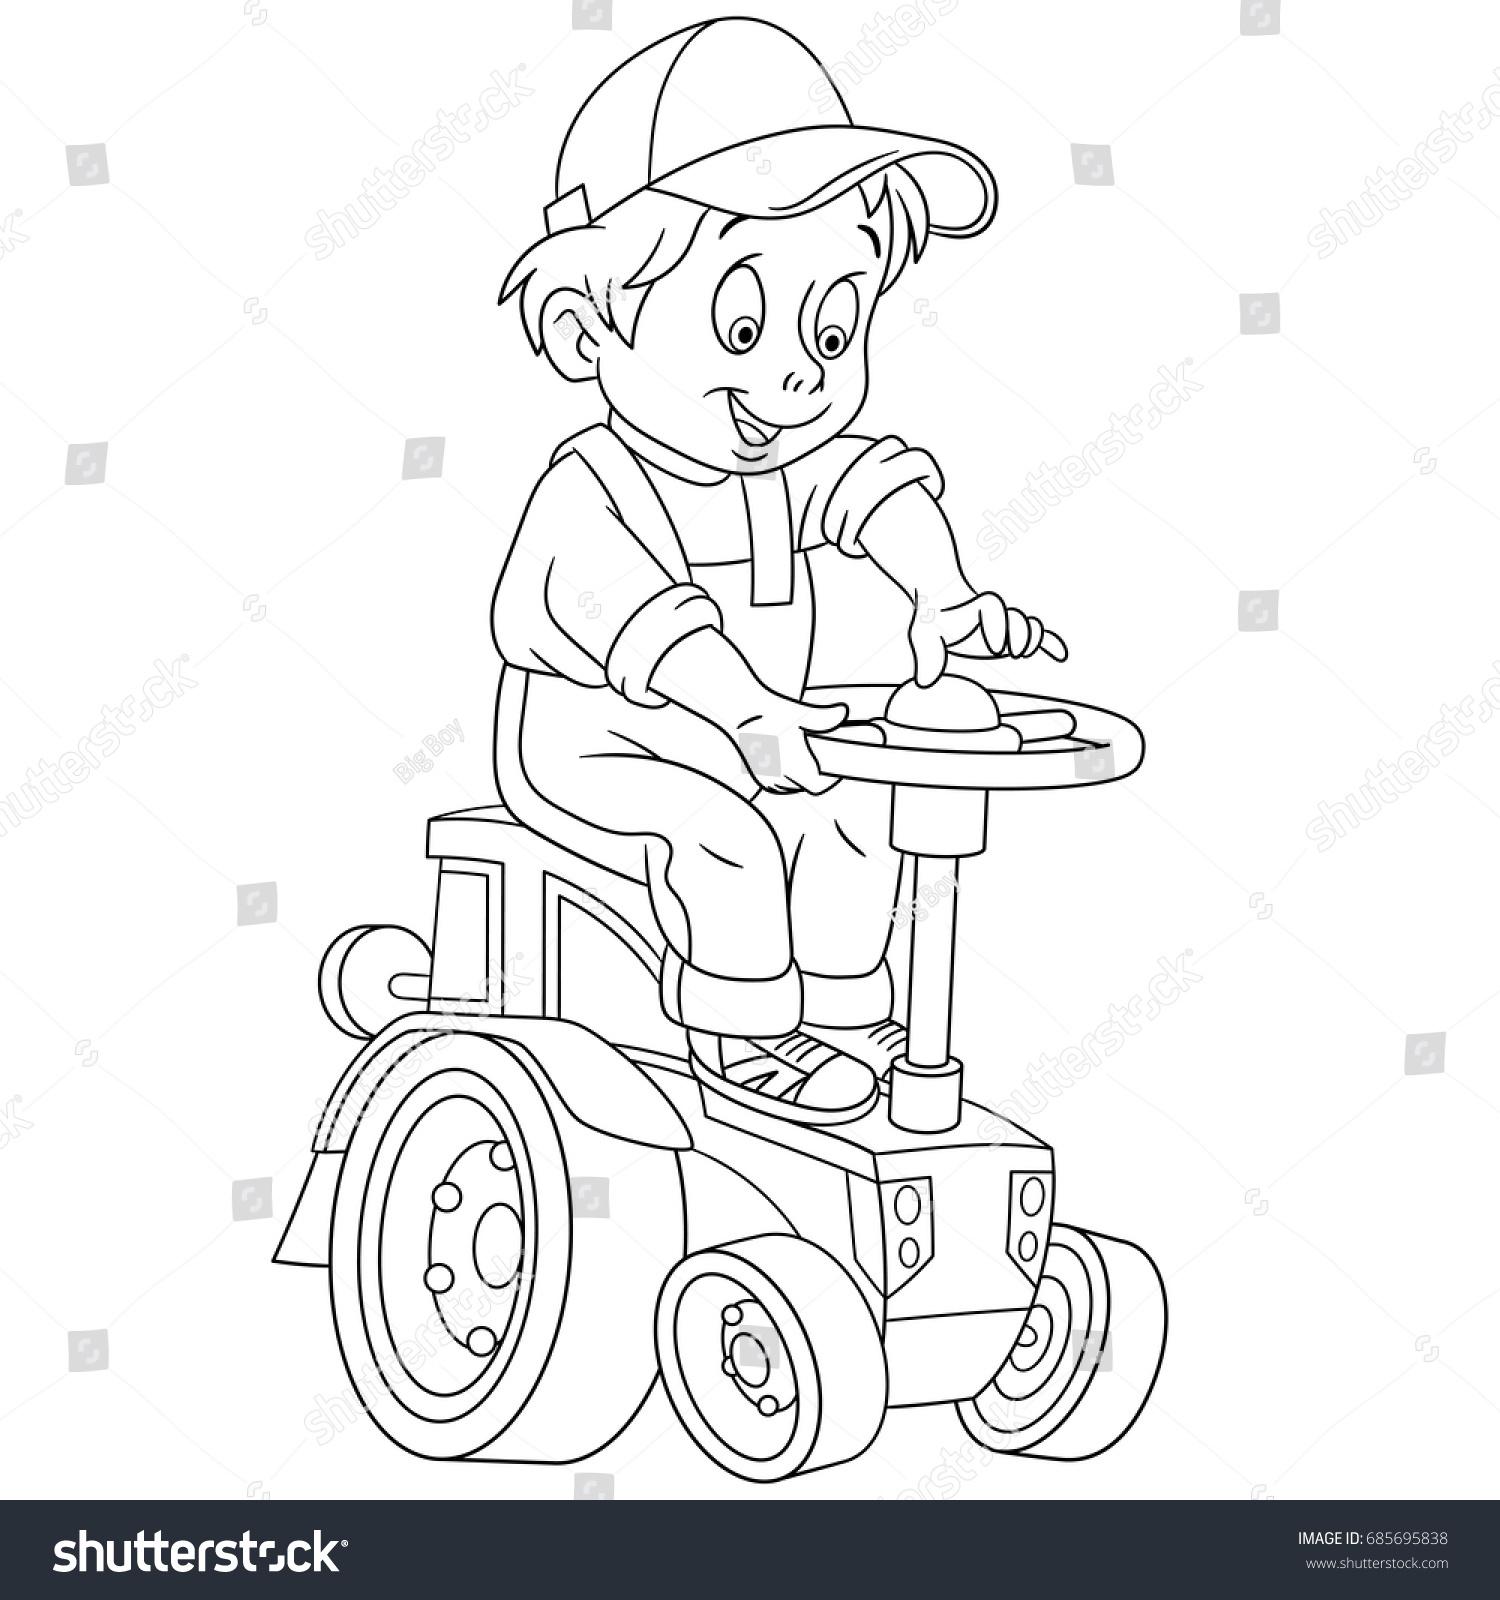 Coloring Page Cartoon Boy Driving Tractor Stock Vector 685695838 ...